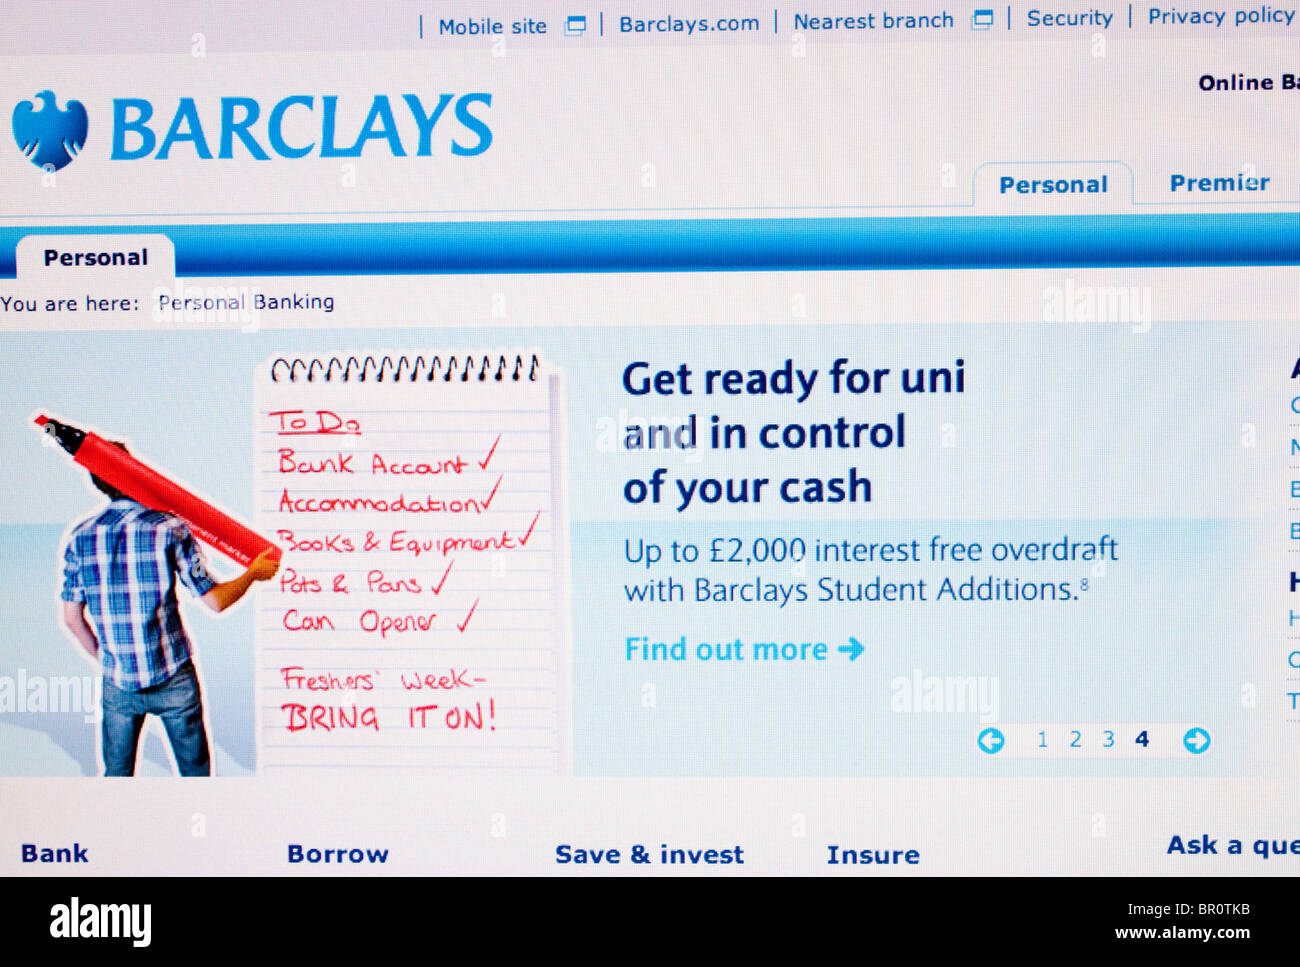 Barclays Bank Screenshot - Stock Image